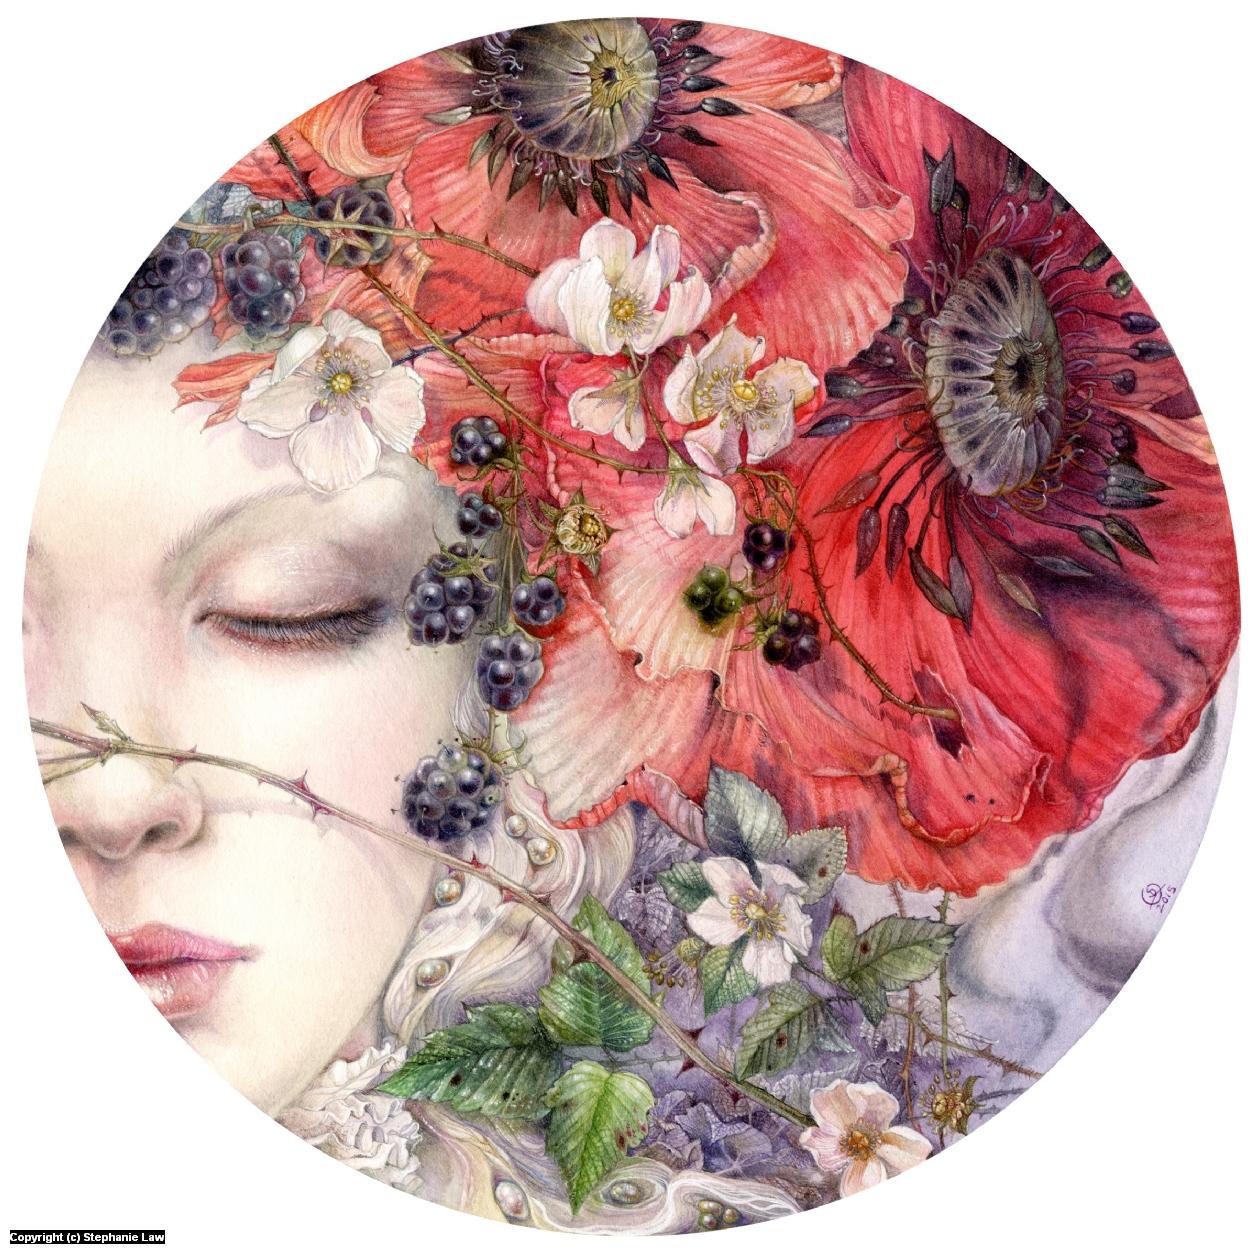 She Sleeps Artwork by Stephanie Law